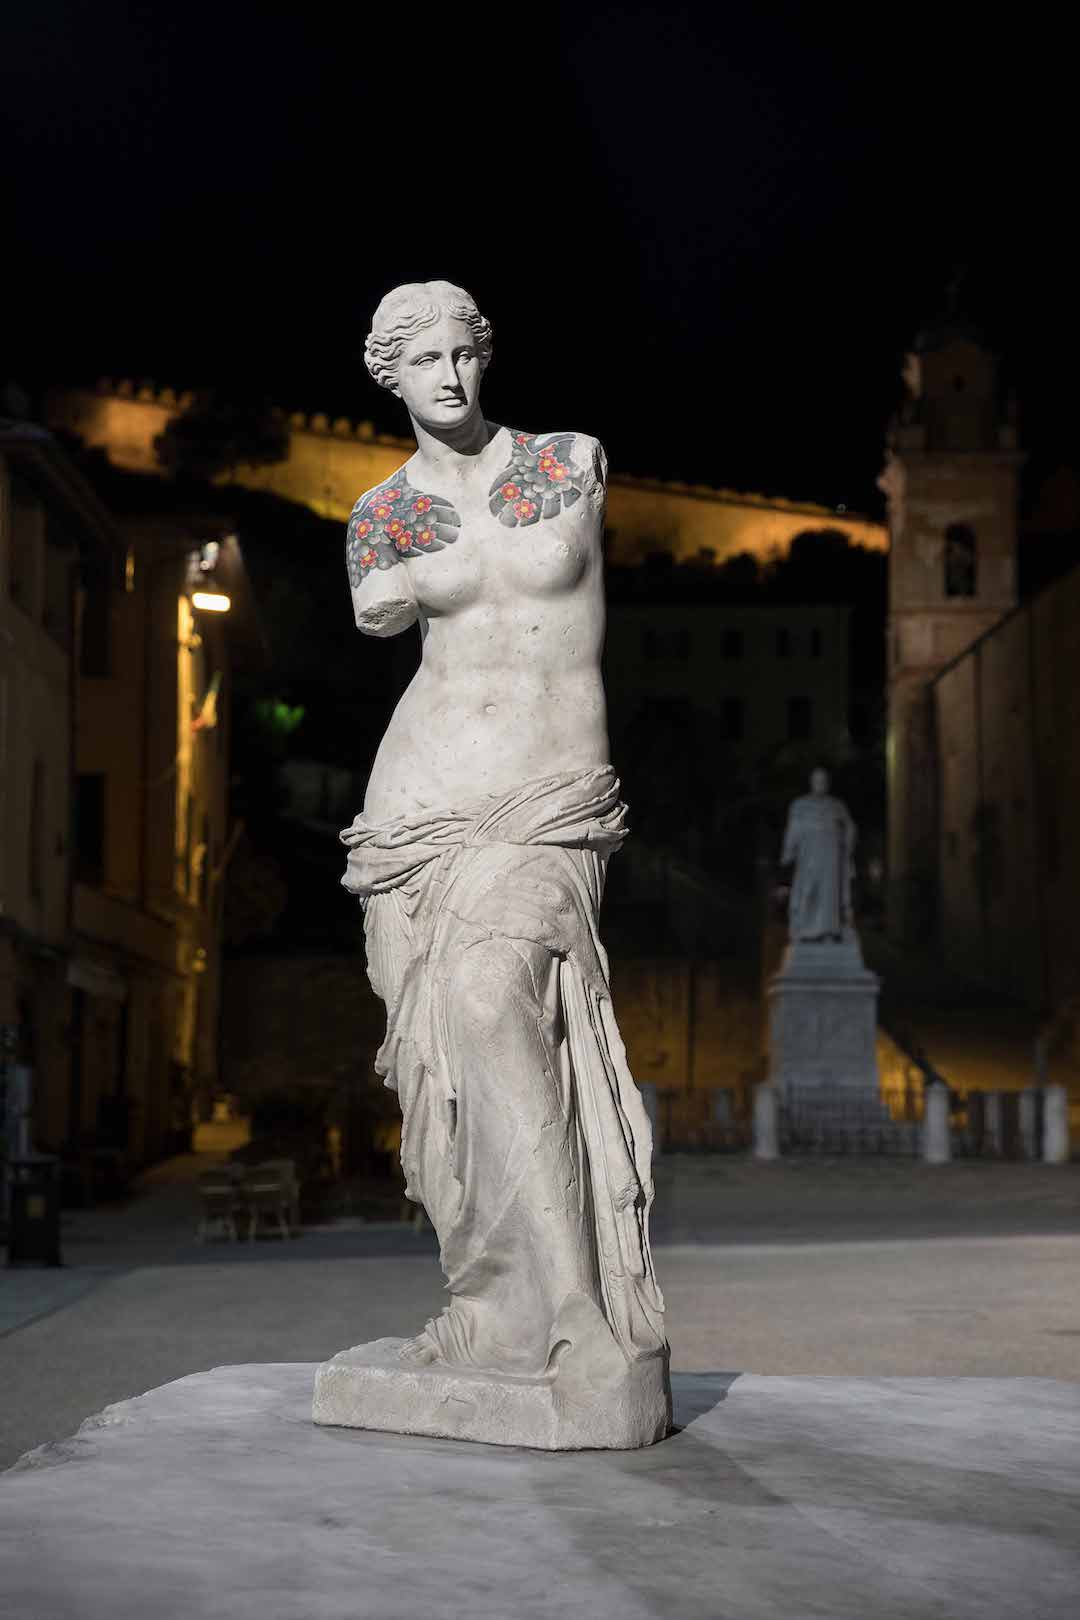 Marble Statue Tattoo : marble, statue, tattoo, Artist, Places, Tattooed, Marble, Sculptures, Historic, Italian